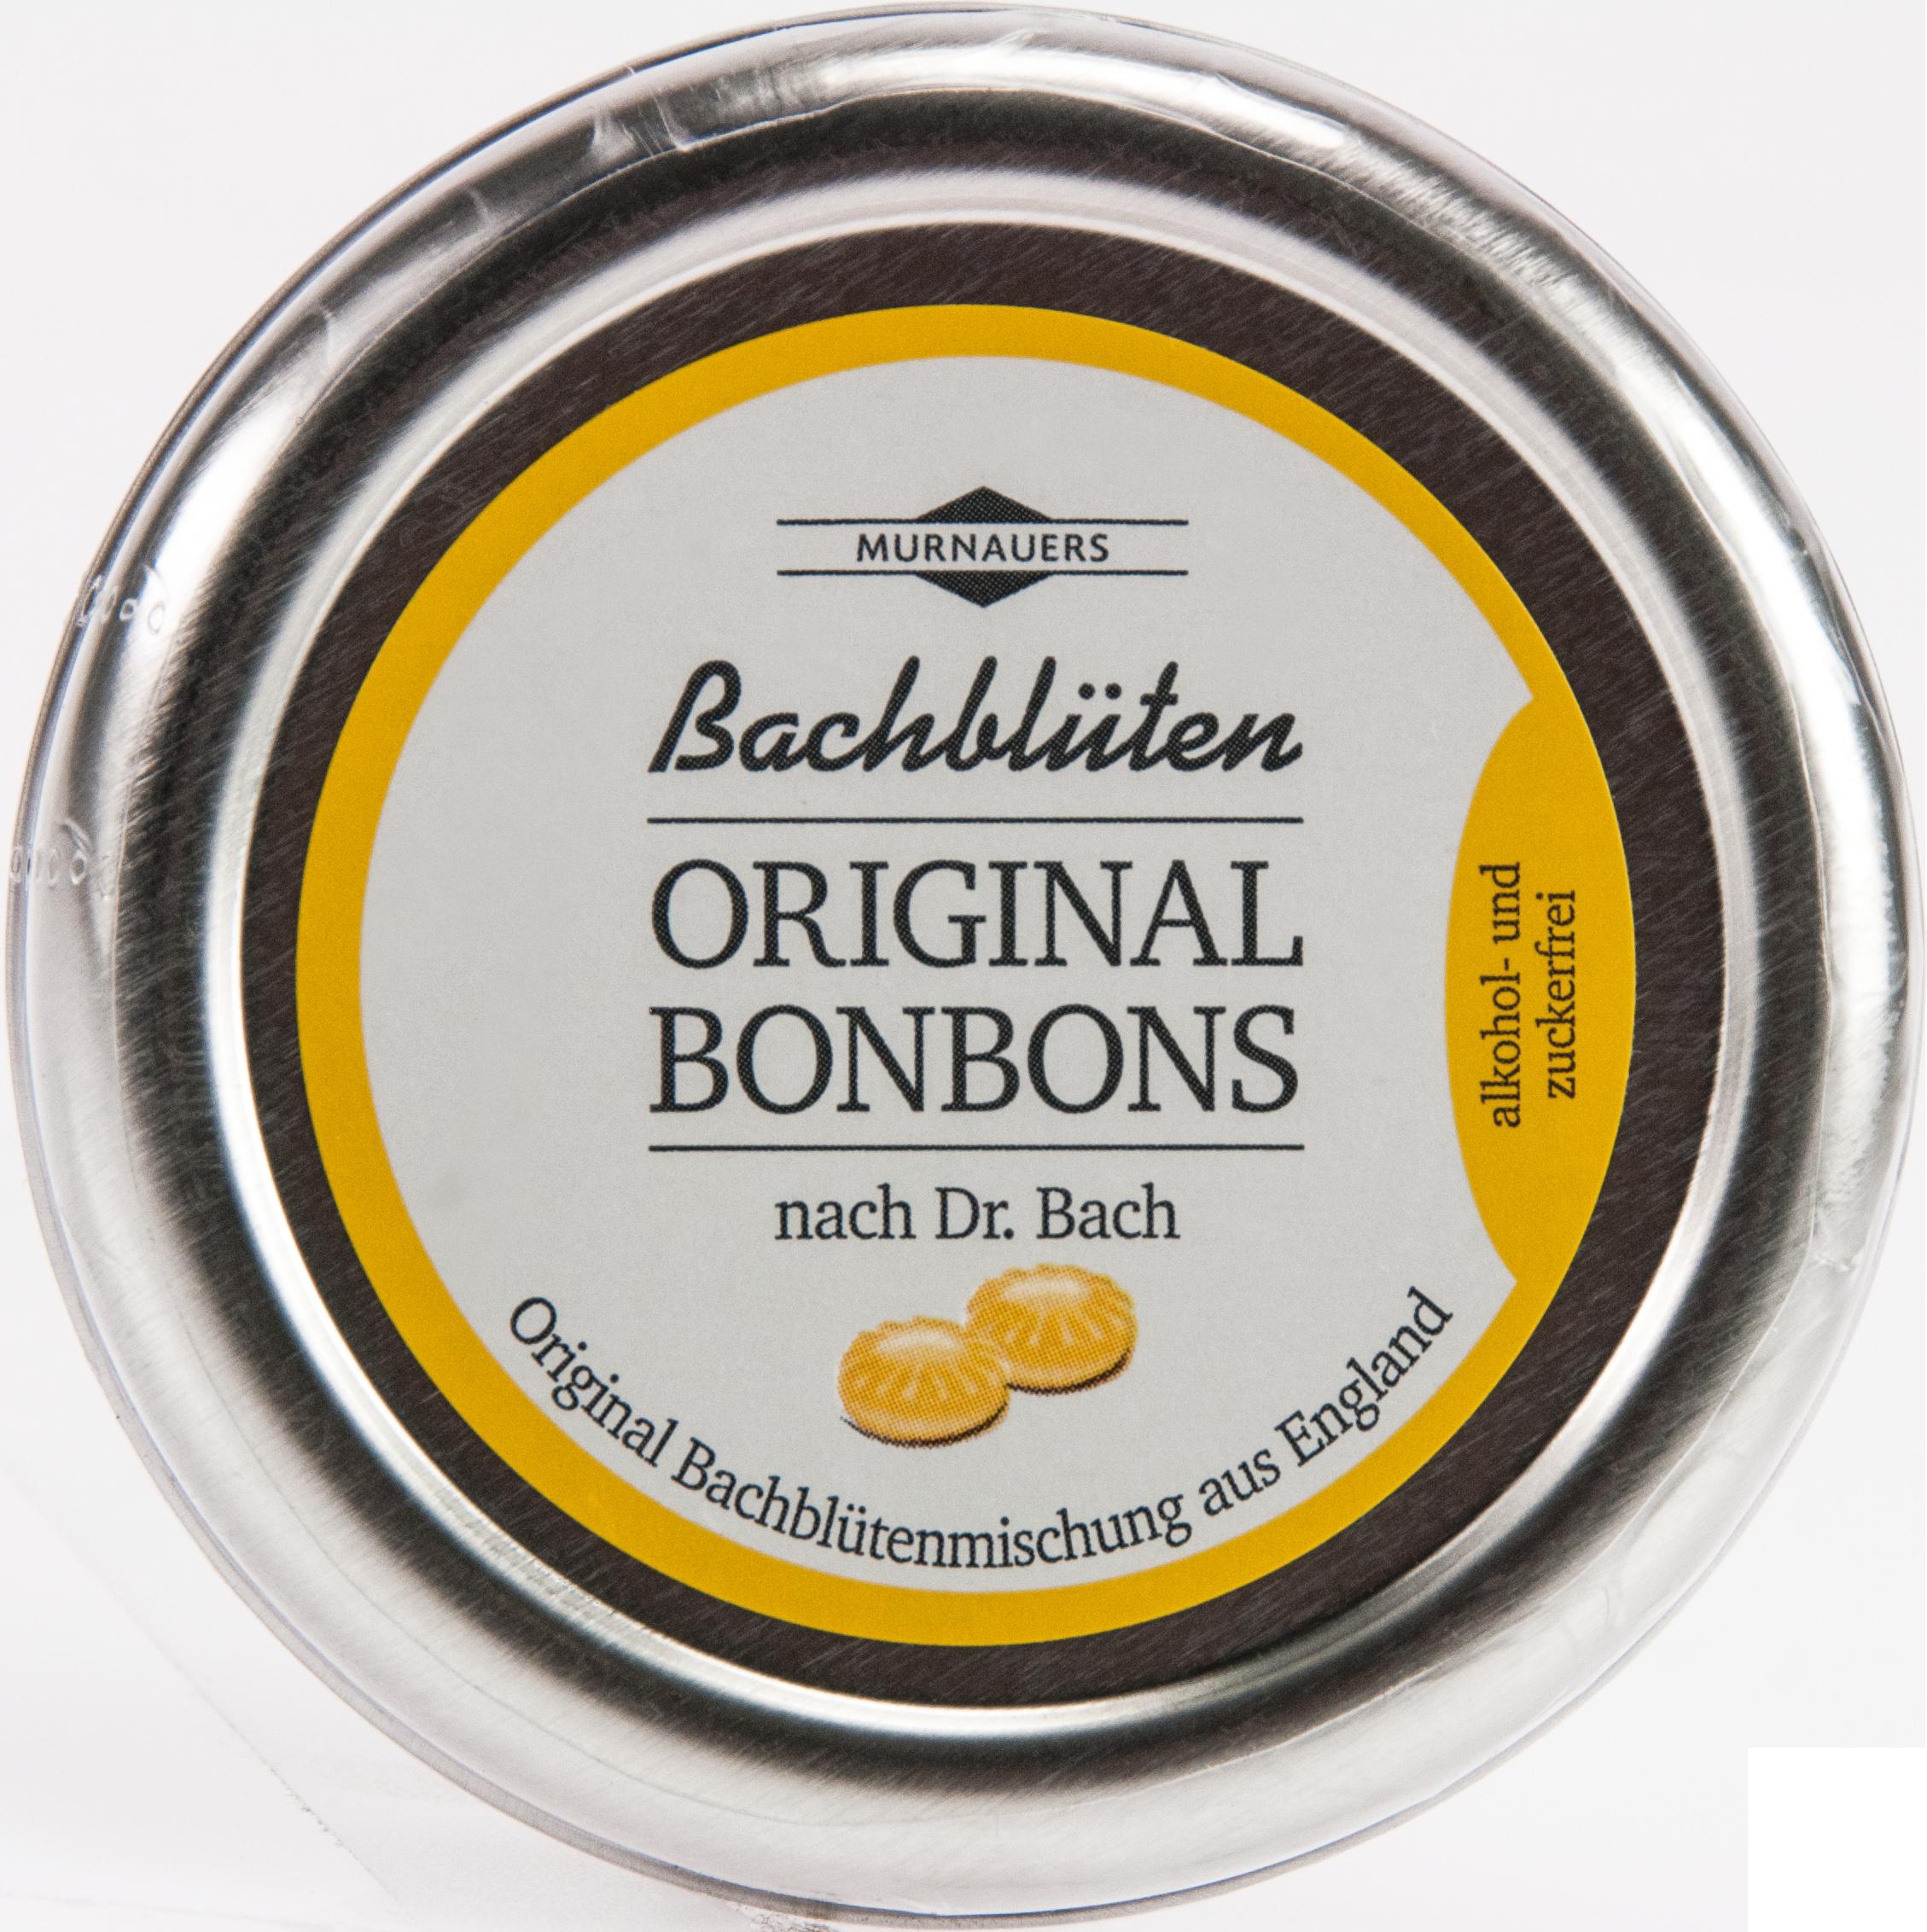 Bachblüten Original Bonbons nach Dr.Bach